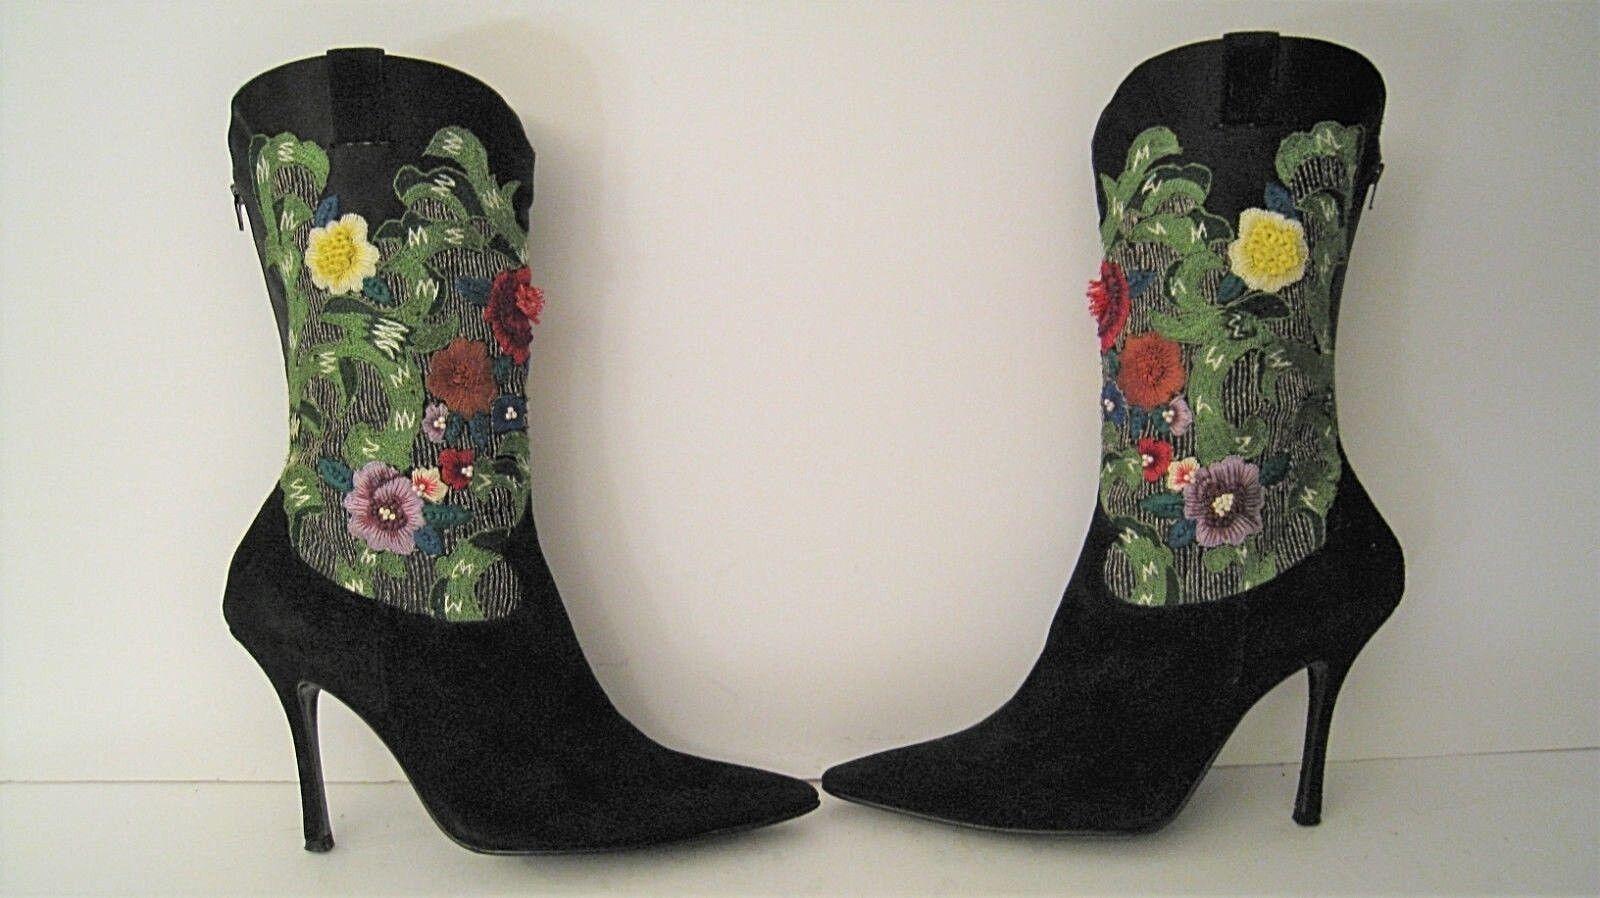 Rene Caovilla Couture Negro botas botas botas De Gamuza De Seda Bordado De Alto 38.5 Como Nuevo Italia 69a229